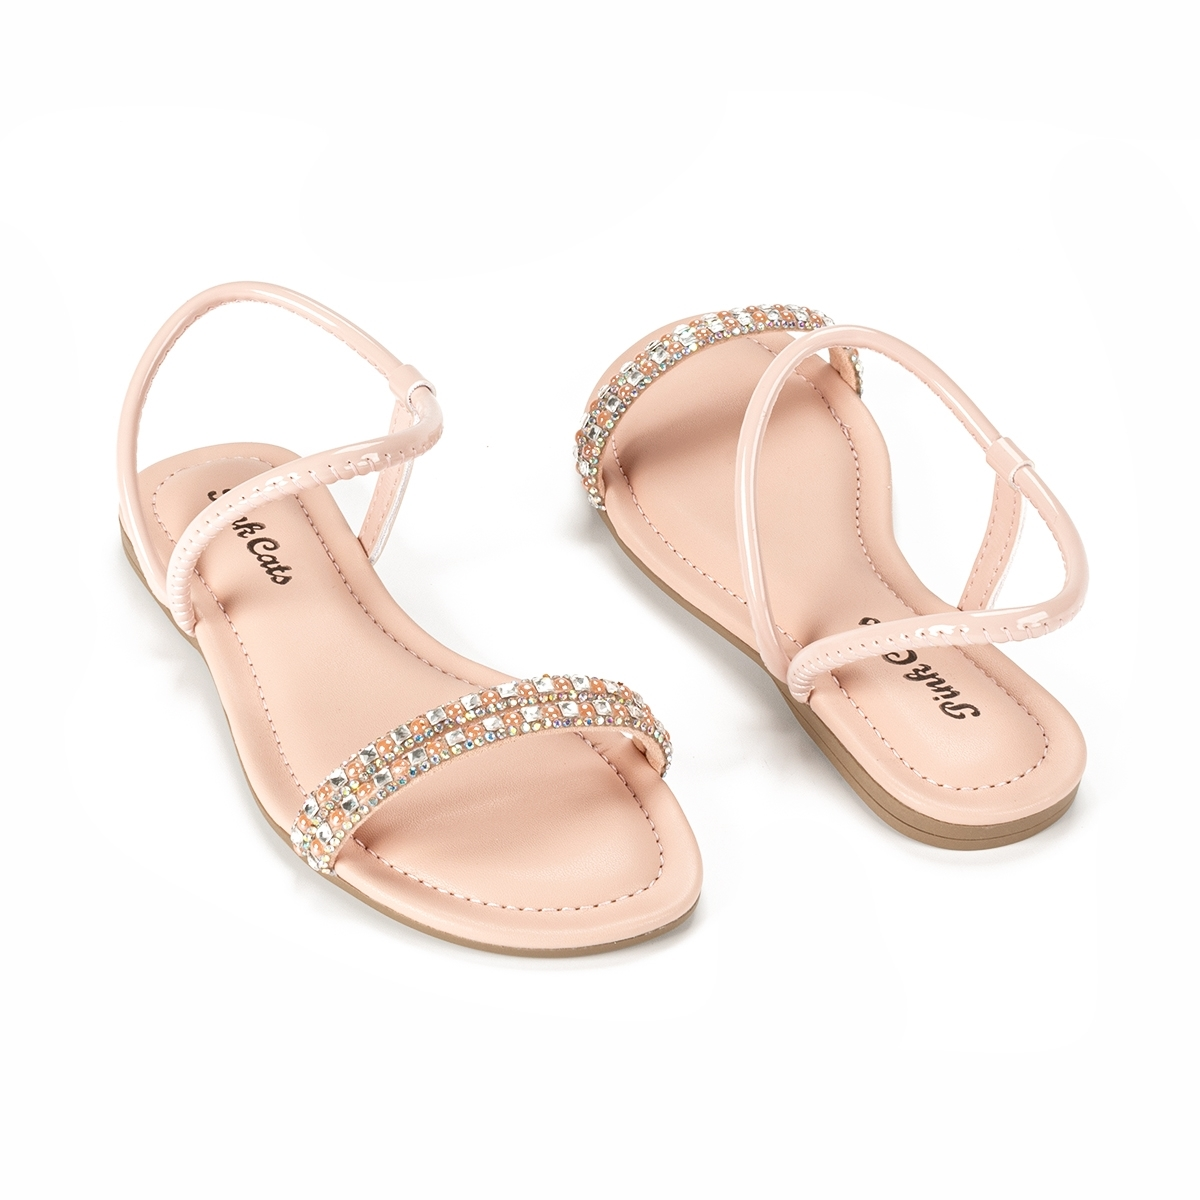 Sandalia Rasteira Infantil Menina Pink Cats V2133